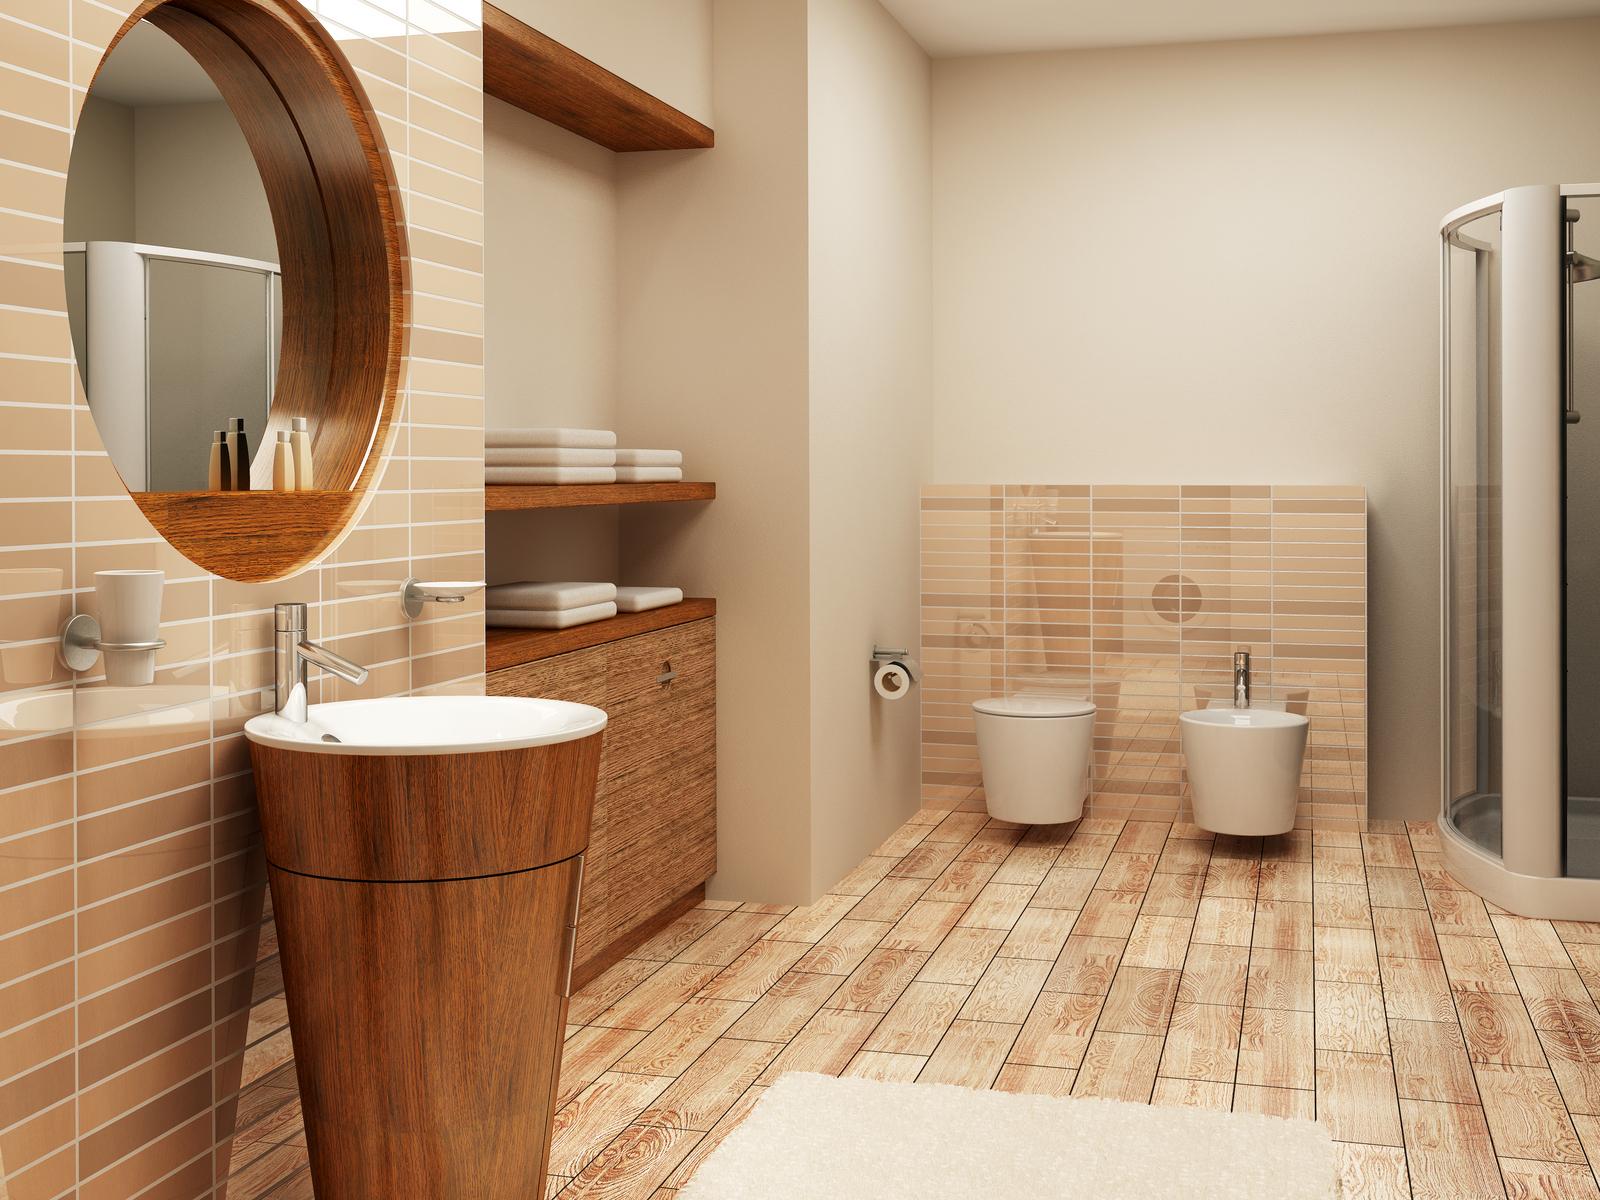 Bathroom Pic LRG 1600 x 1200.jpg